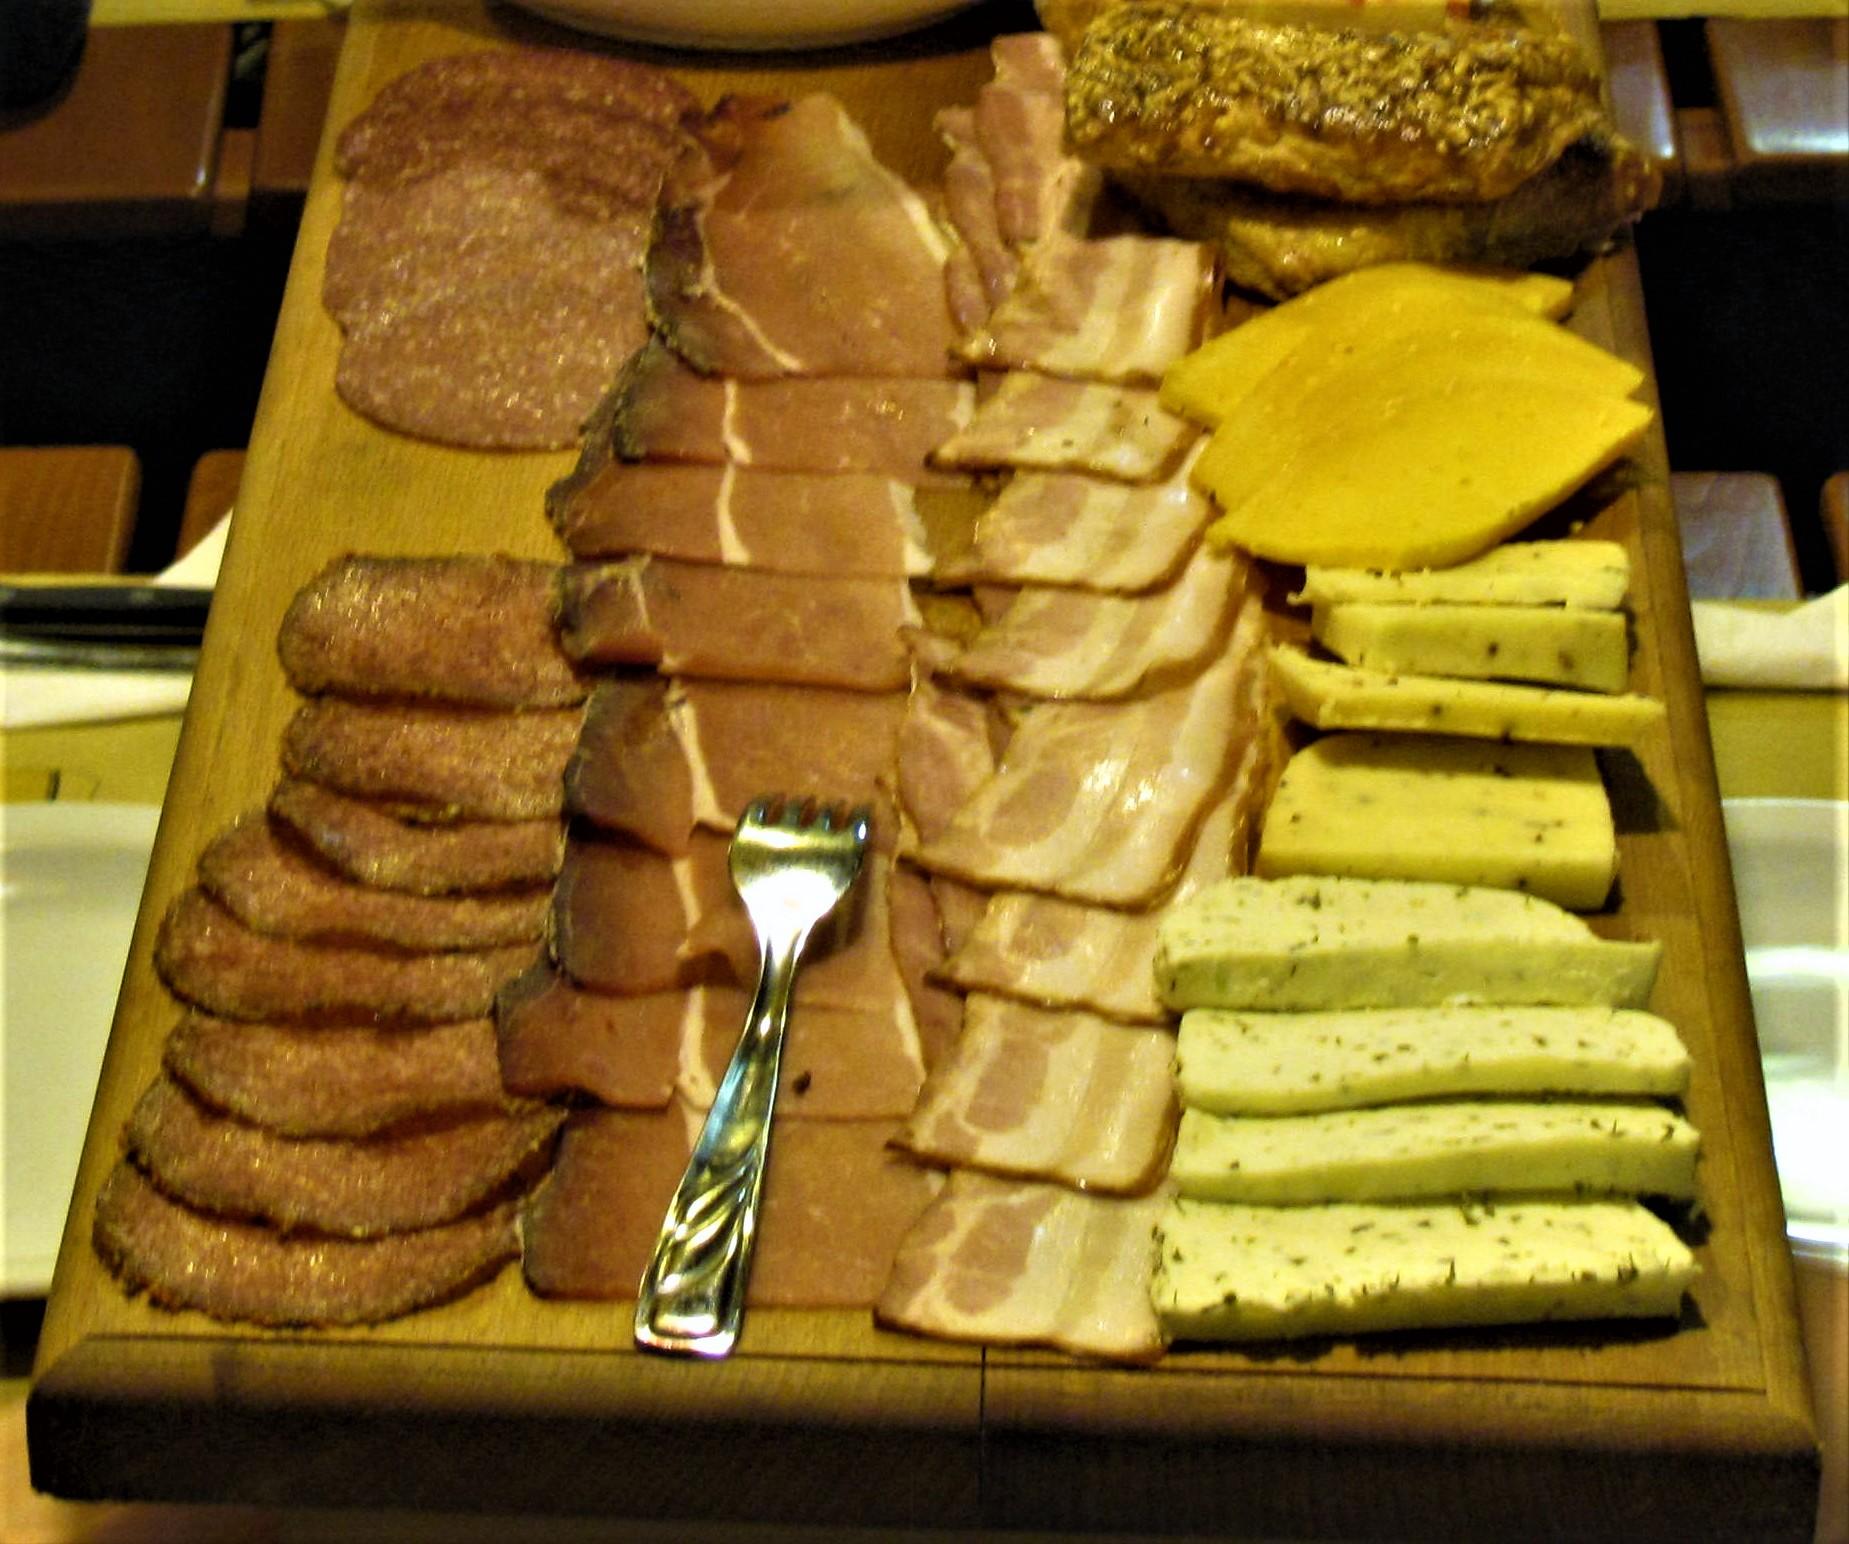 La Buca Gasthaus - Bauerteller - Tagliere di salumi, formaggi, brezel